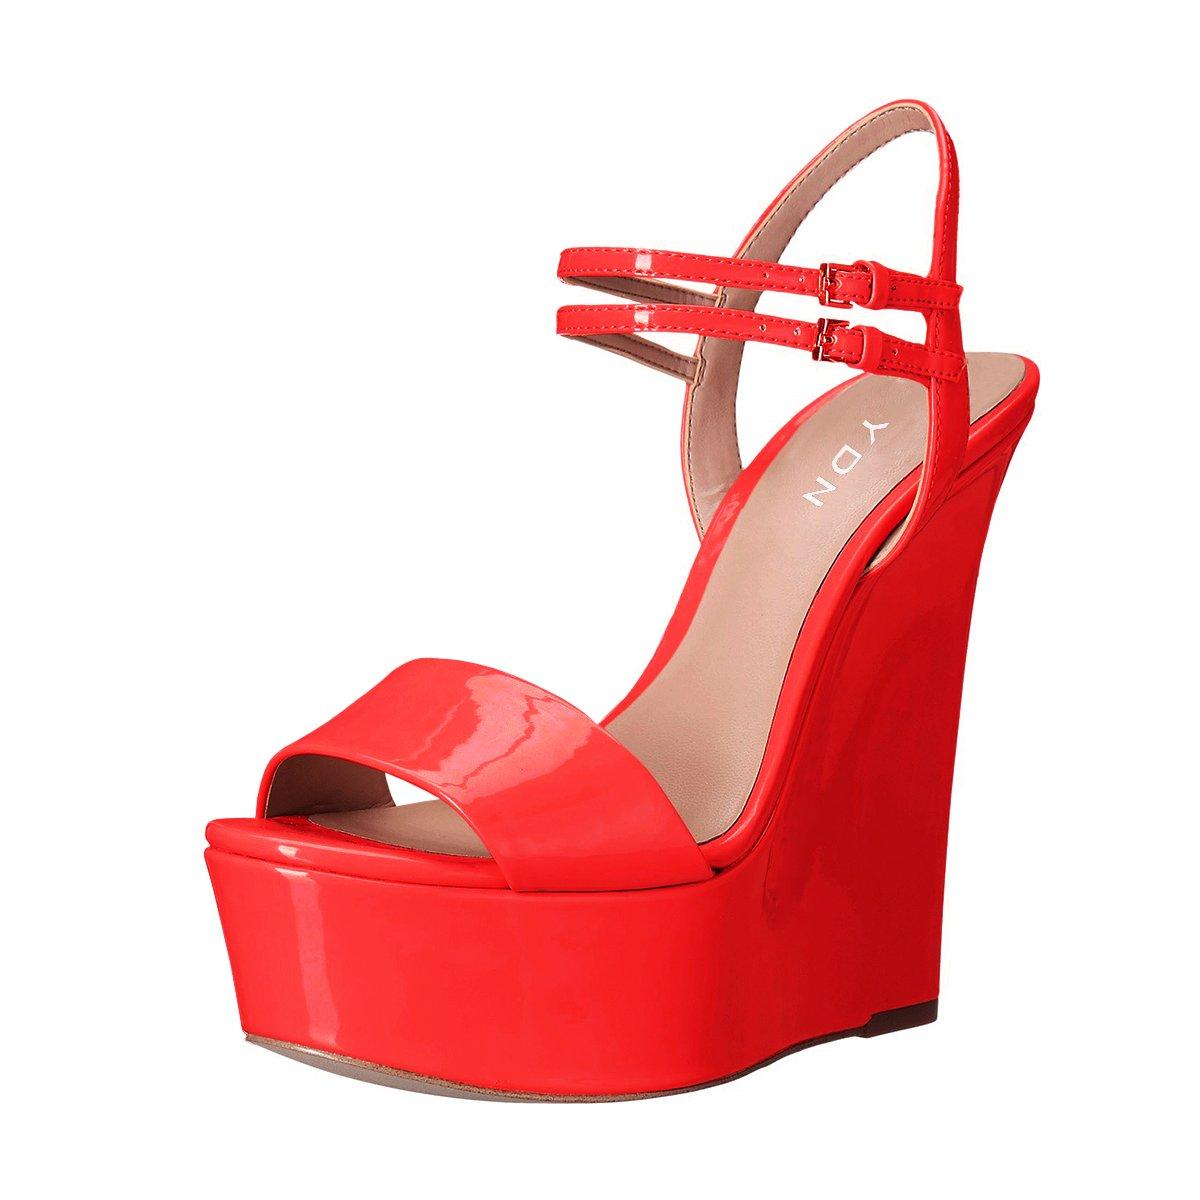 YDN Women Peep Toe High Heel Wedge Sandals Ankle Straps Platform Pumps Slingback Shoes B0722Y5TX3 10 B(M) US|Red